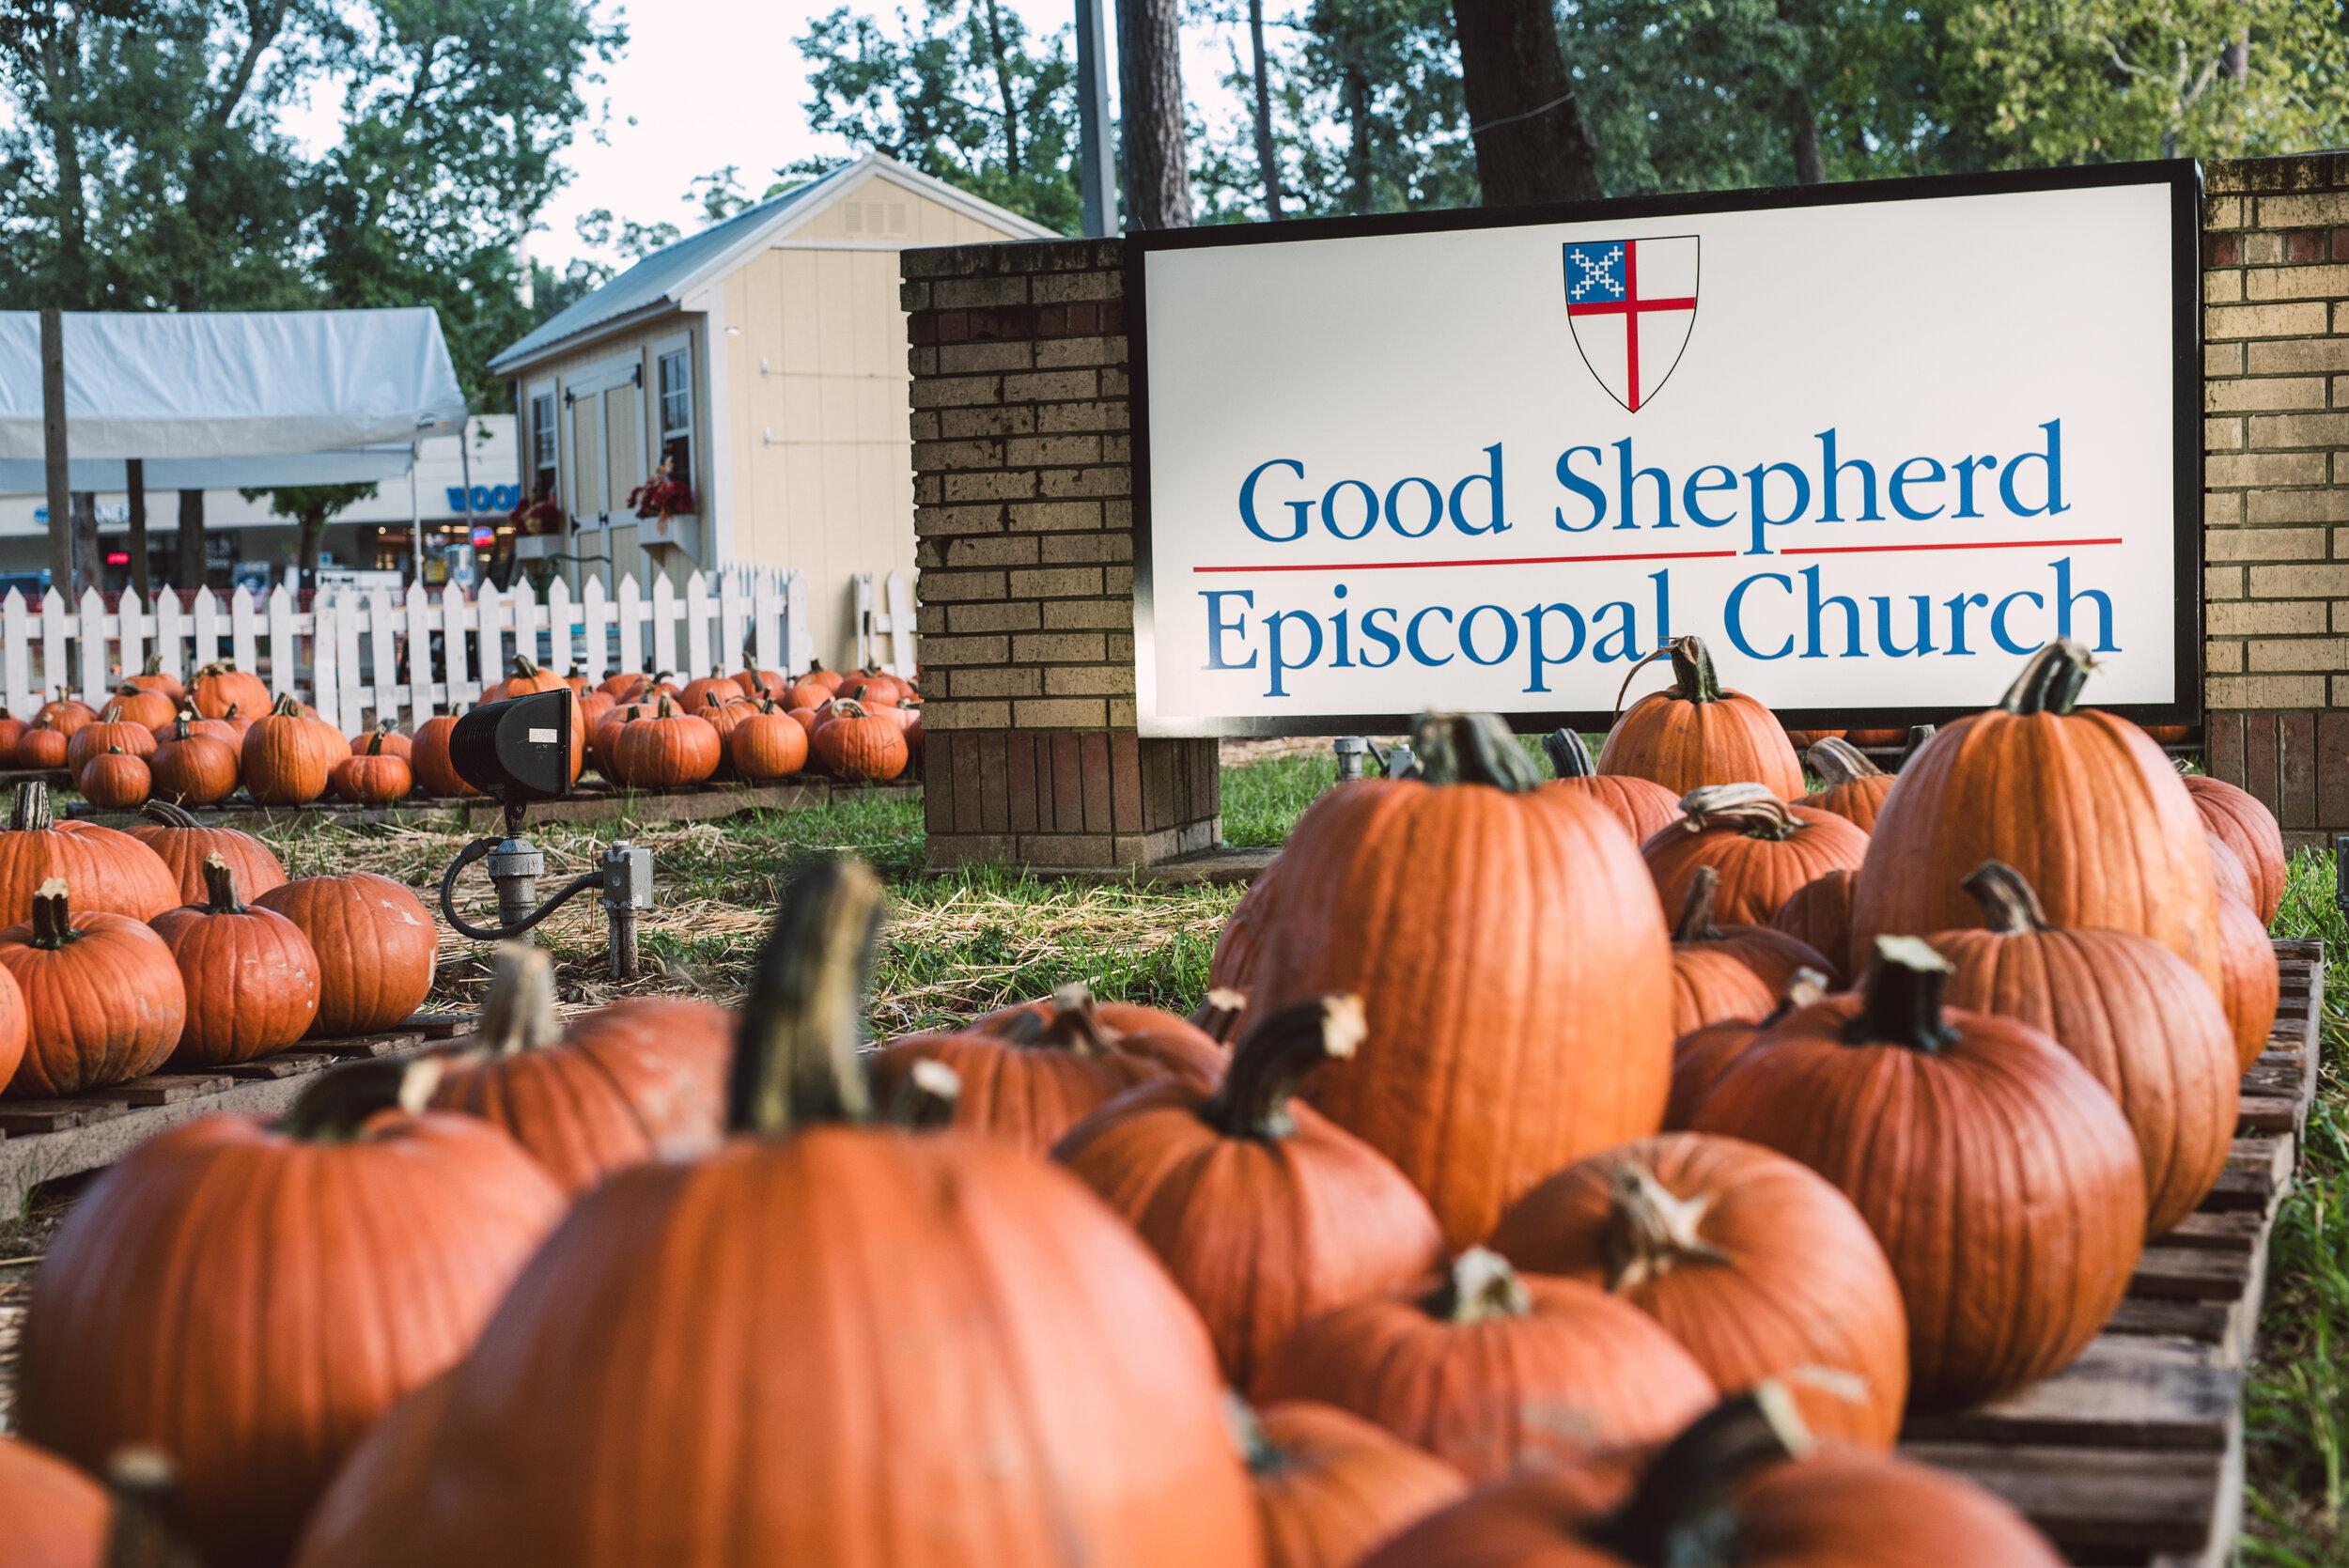 2019_Good Shepherd_Pumpkin Patch_SelectsDSC_4079.jpg